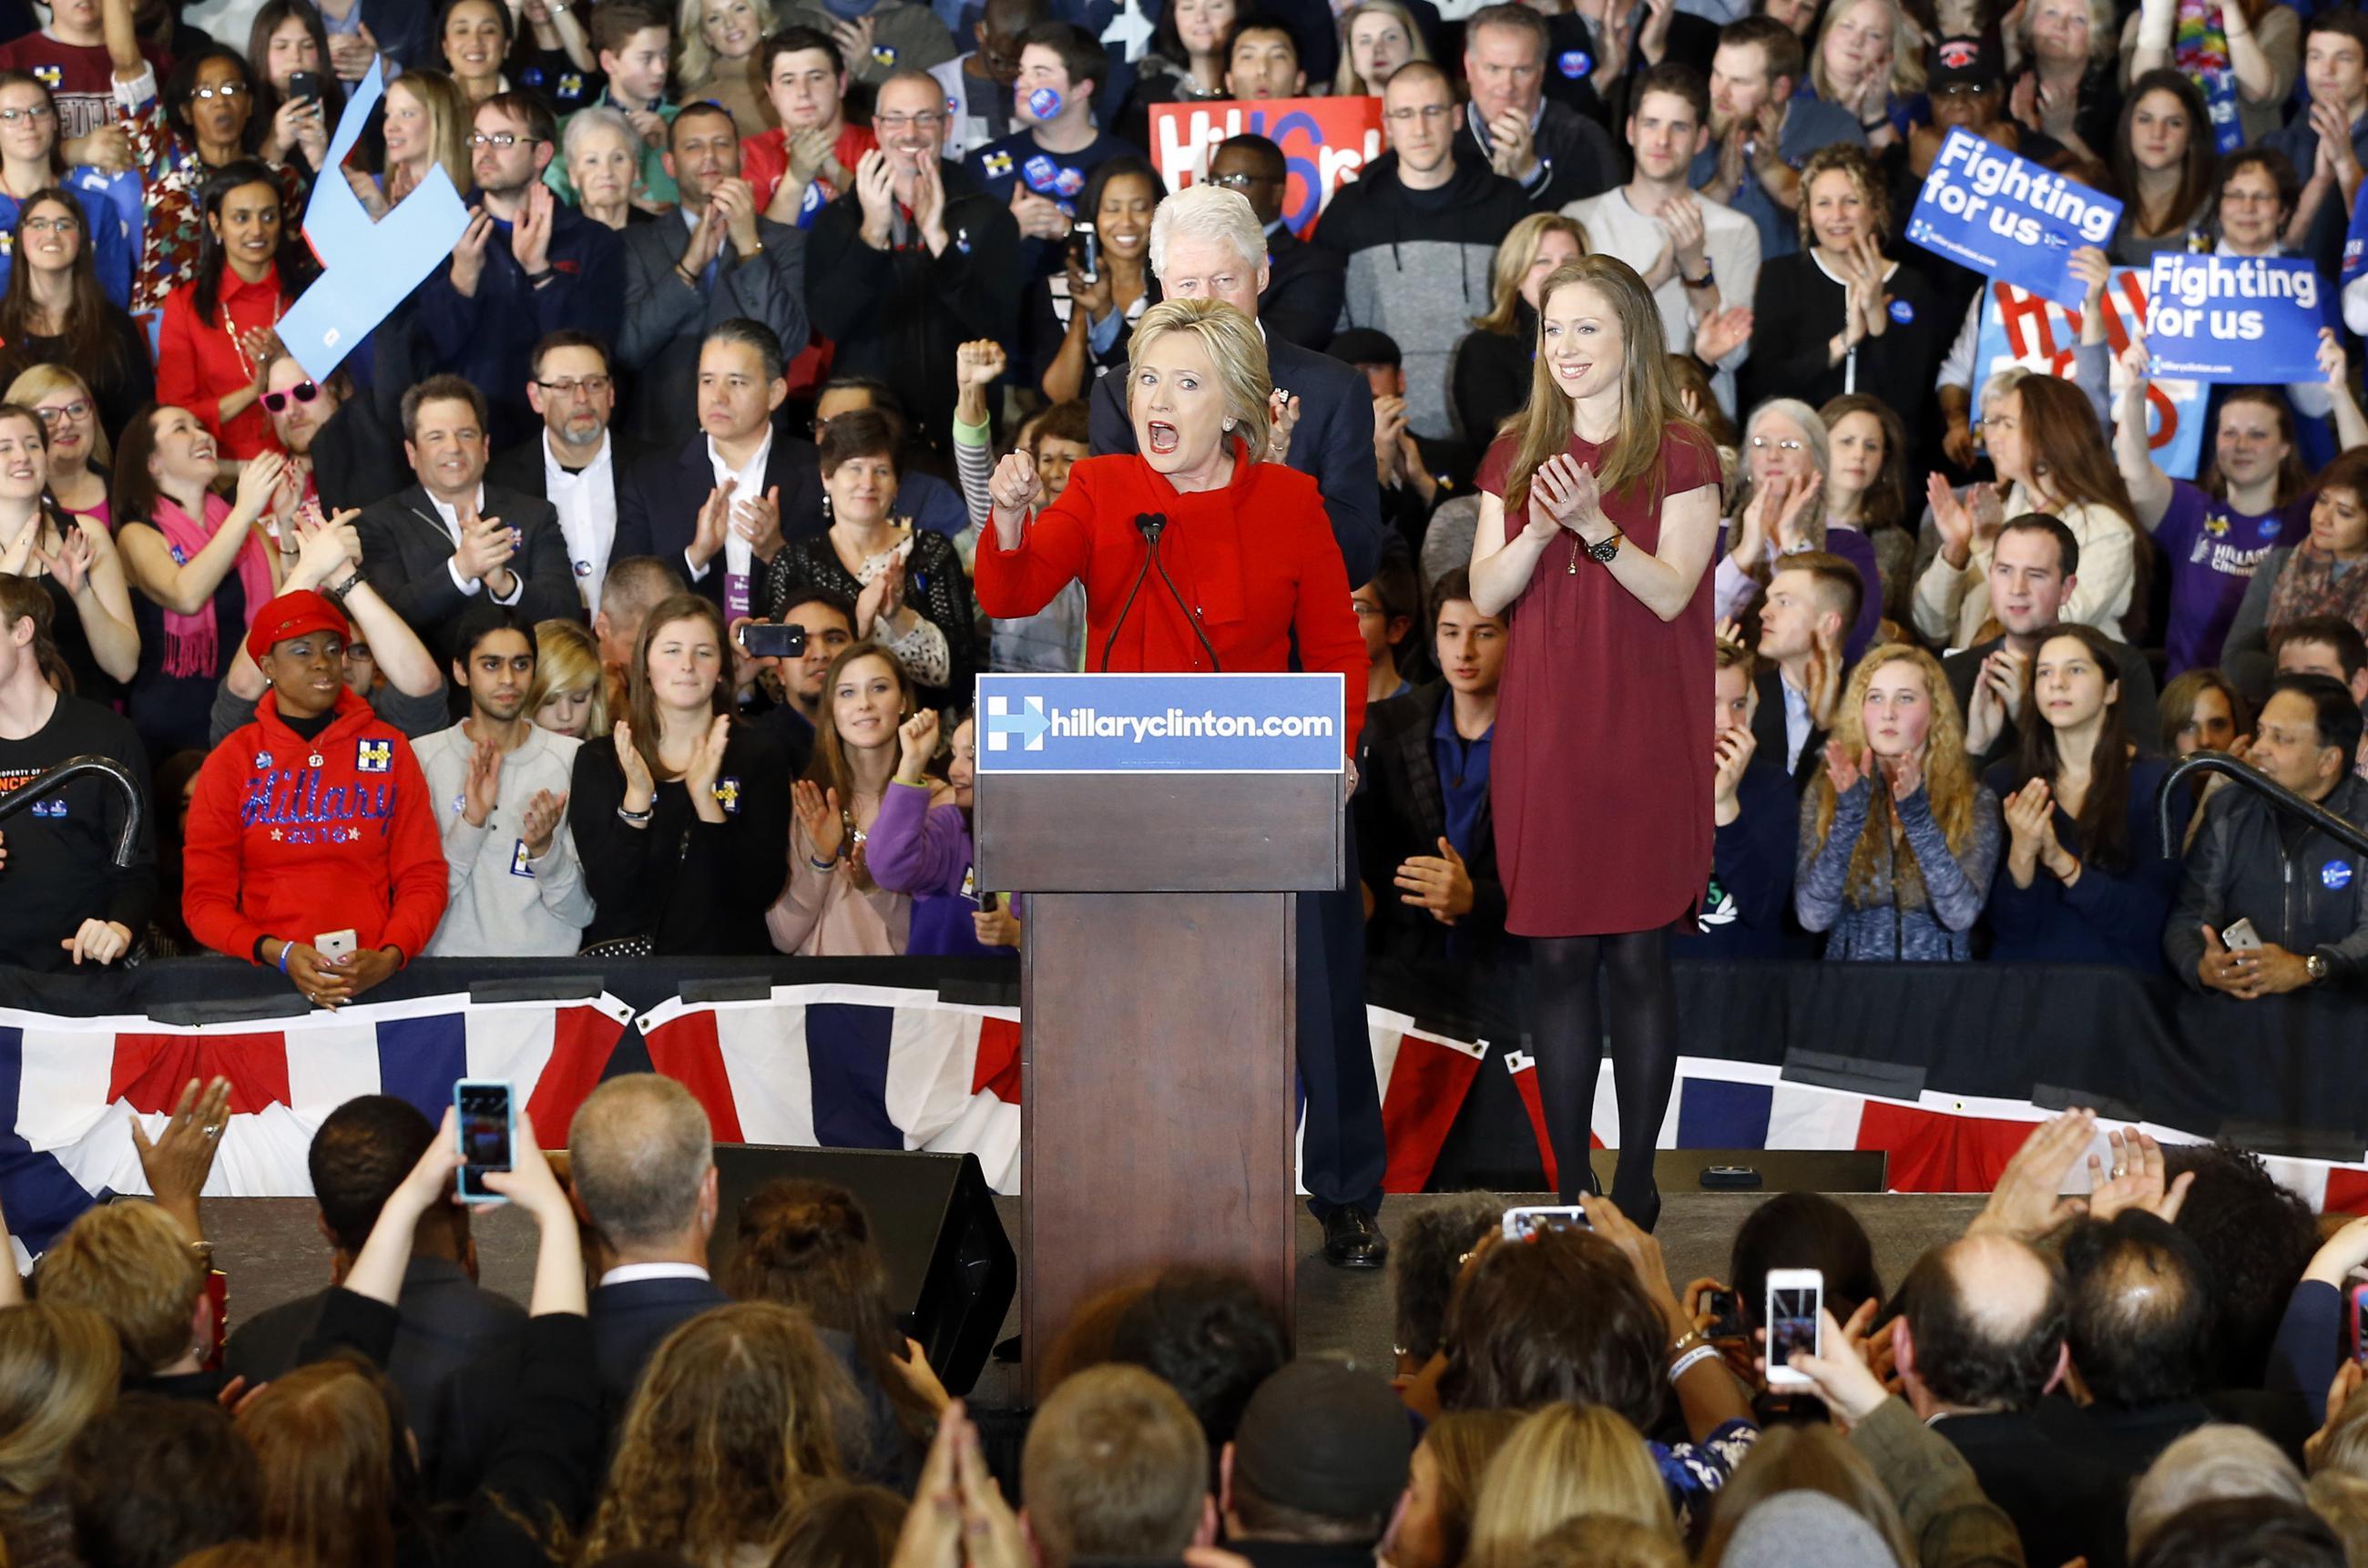 Up Next: New Hampshire and FBI Primaries